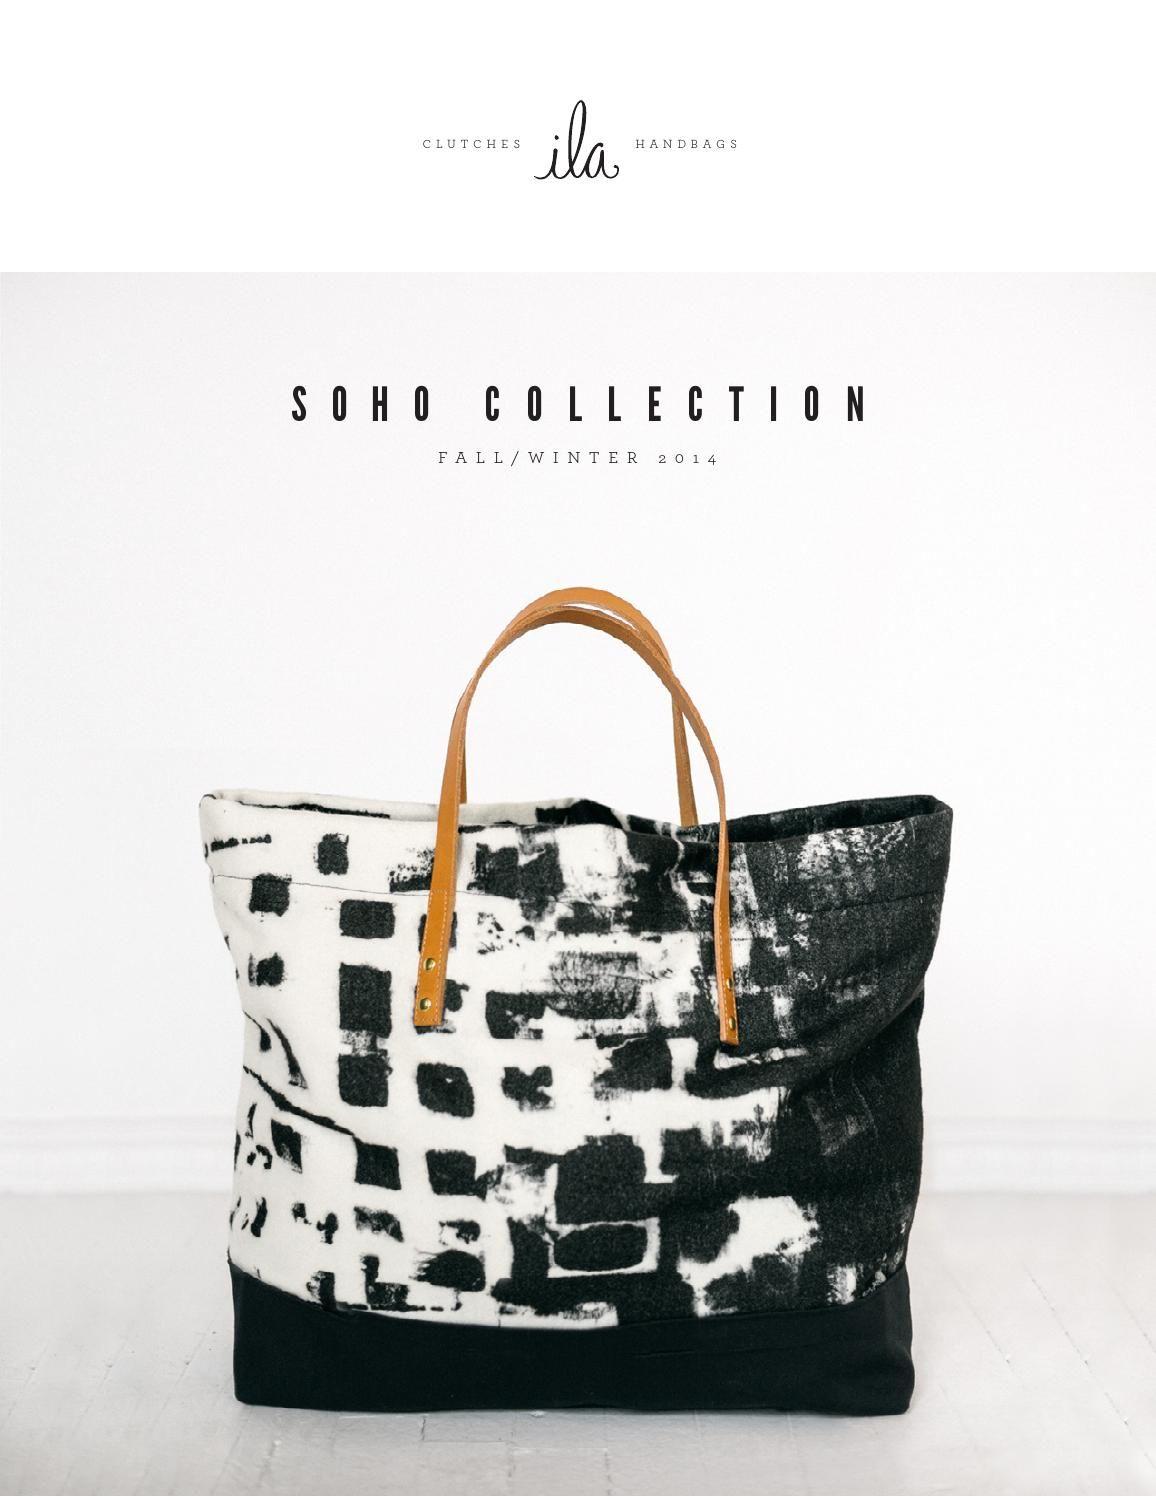 ila 2014 Fall/Winter Soho Collection